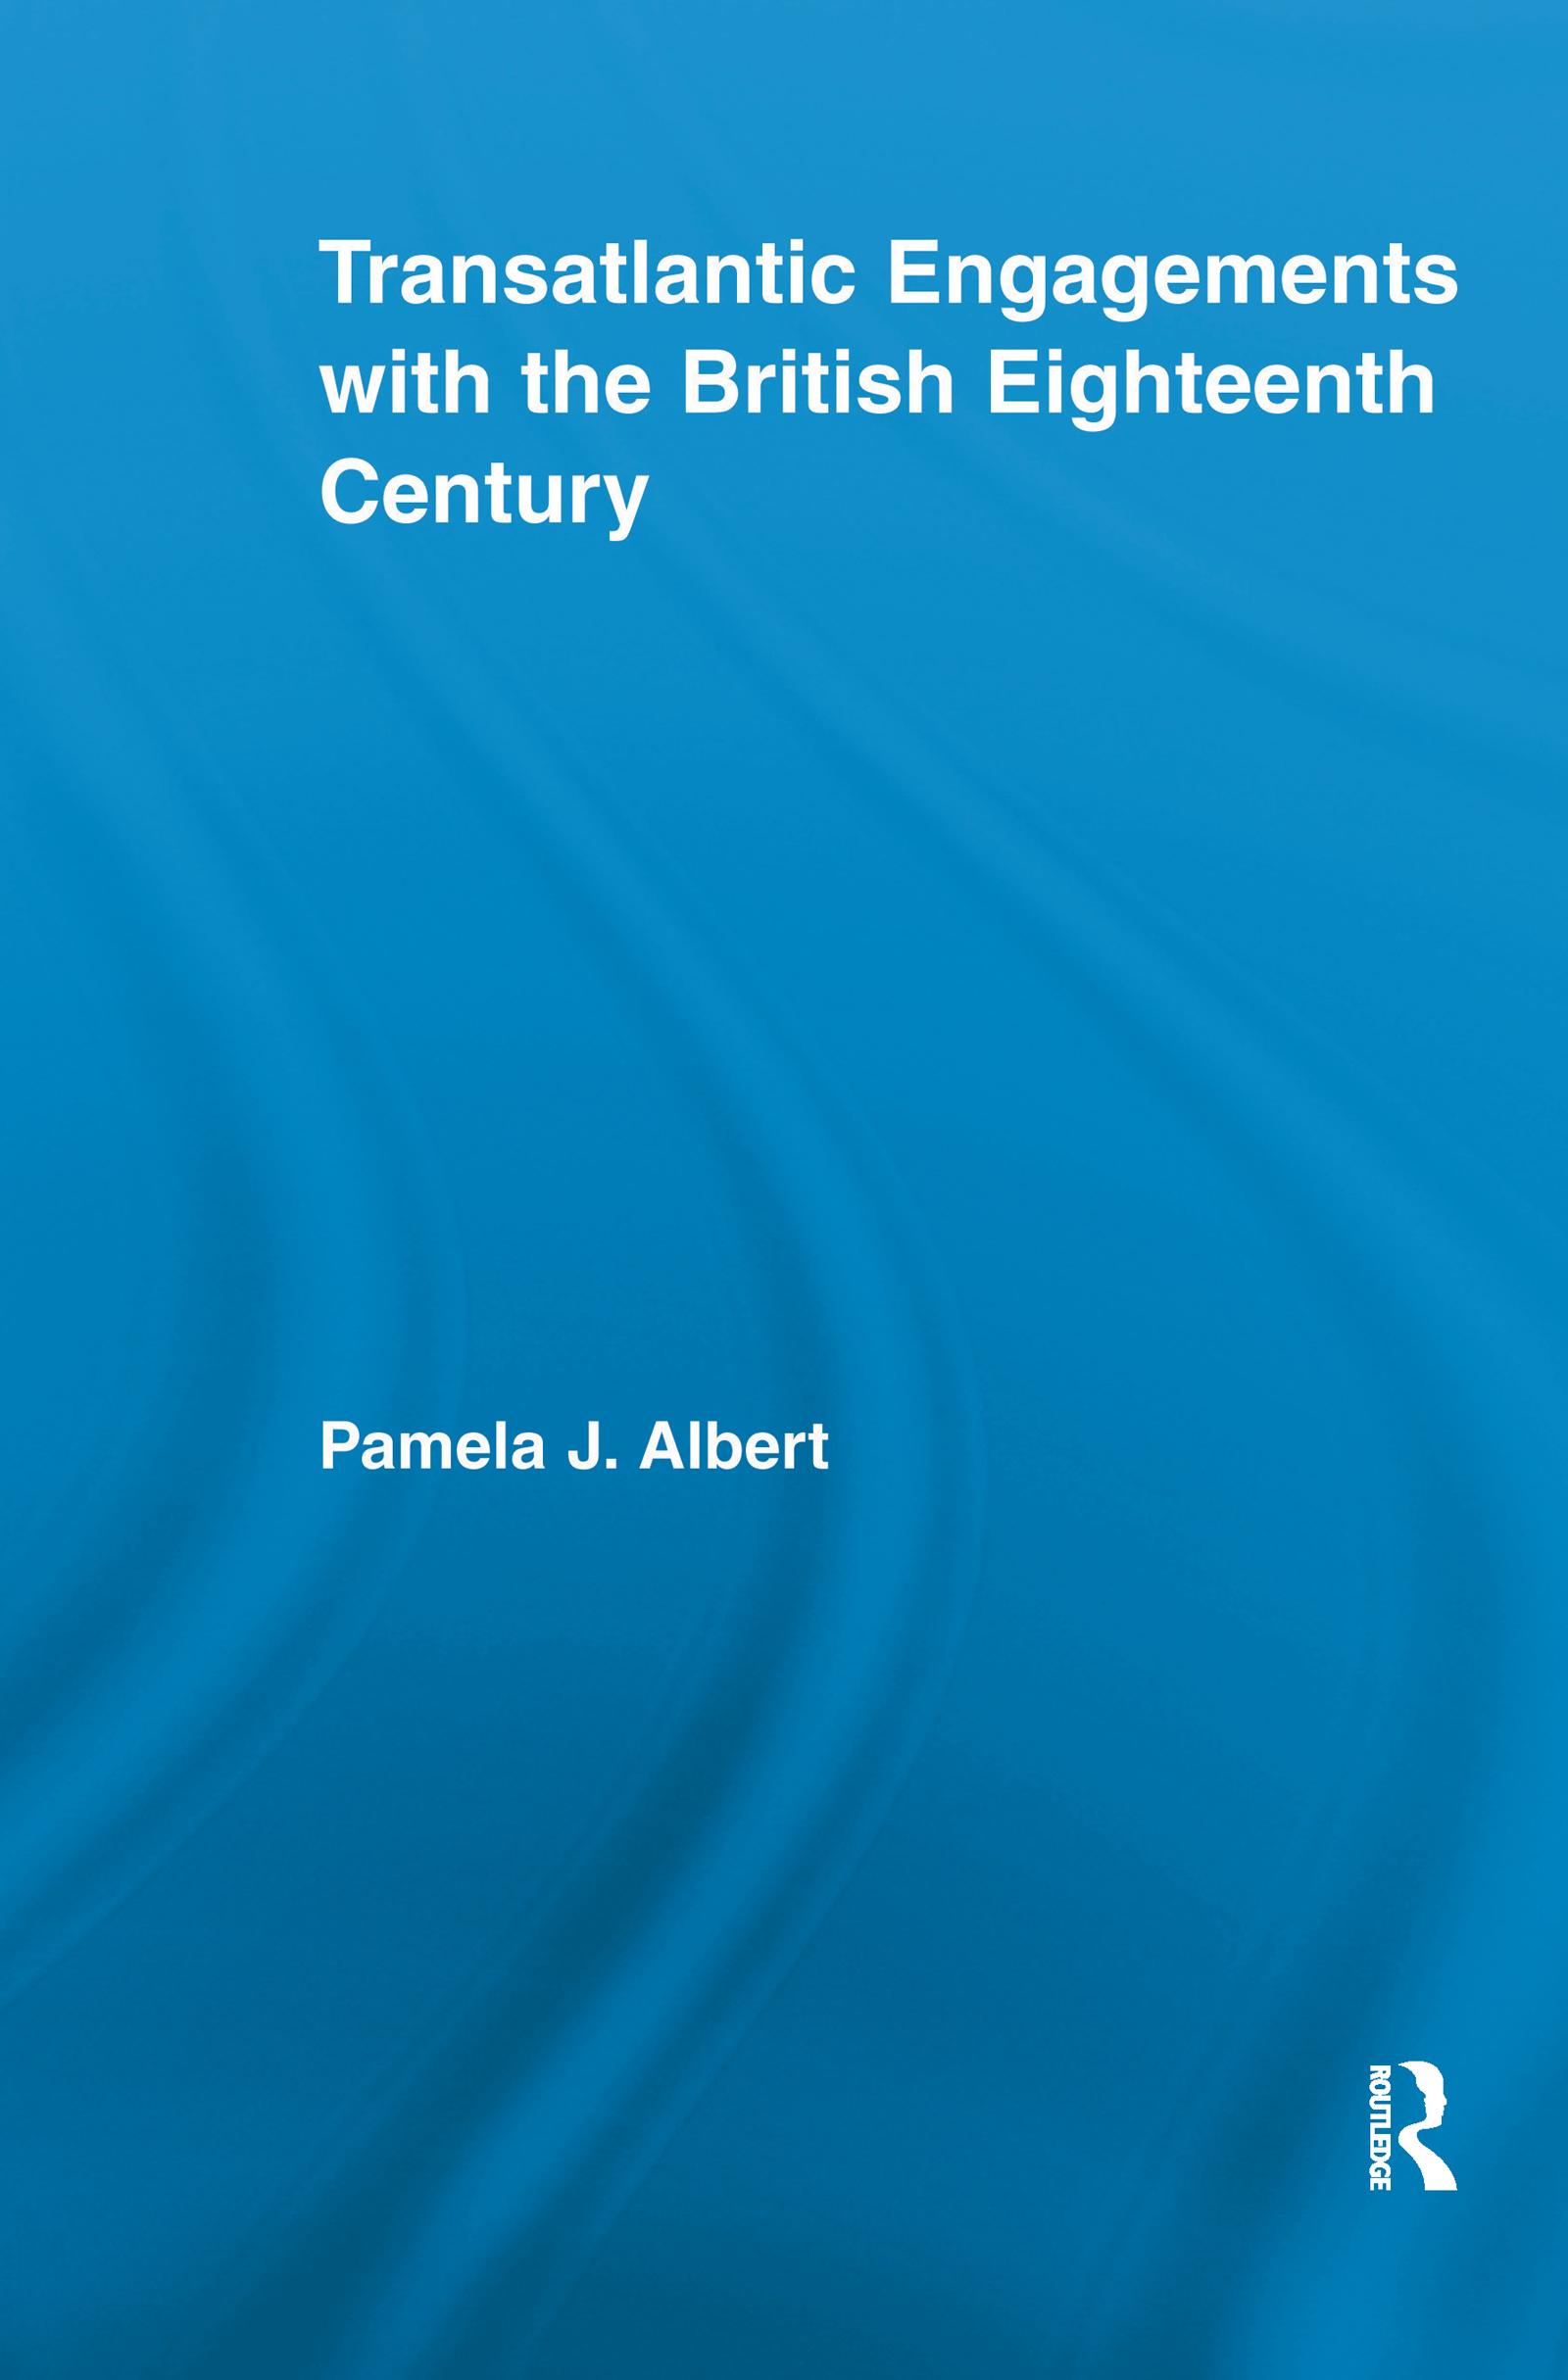 Transatlantic Engagements with the British Eighteenth Century